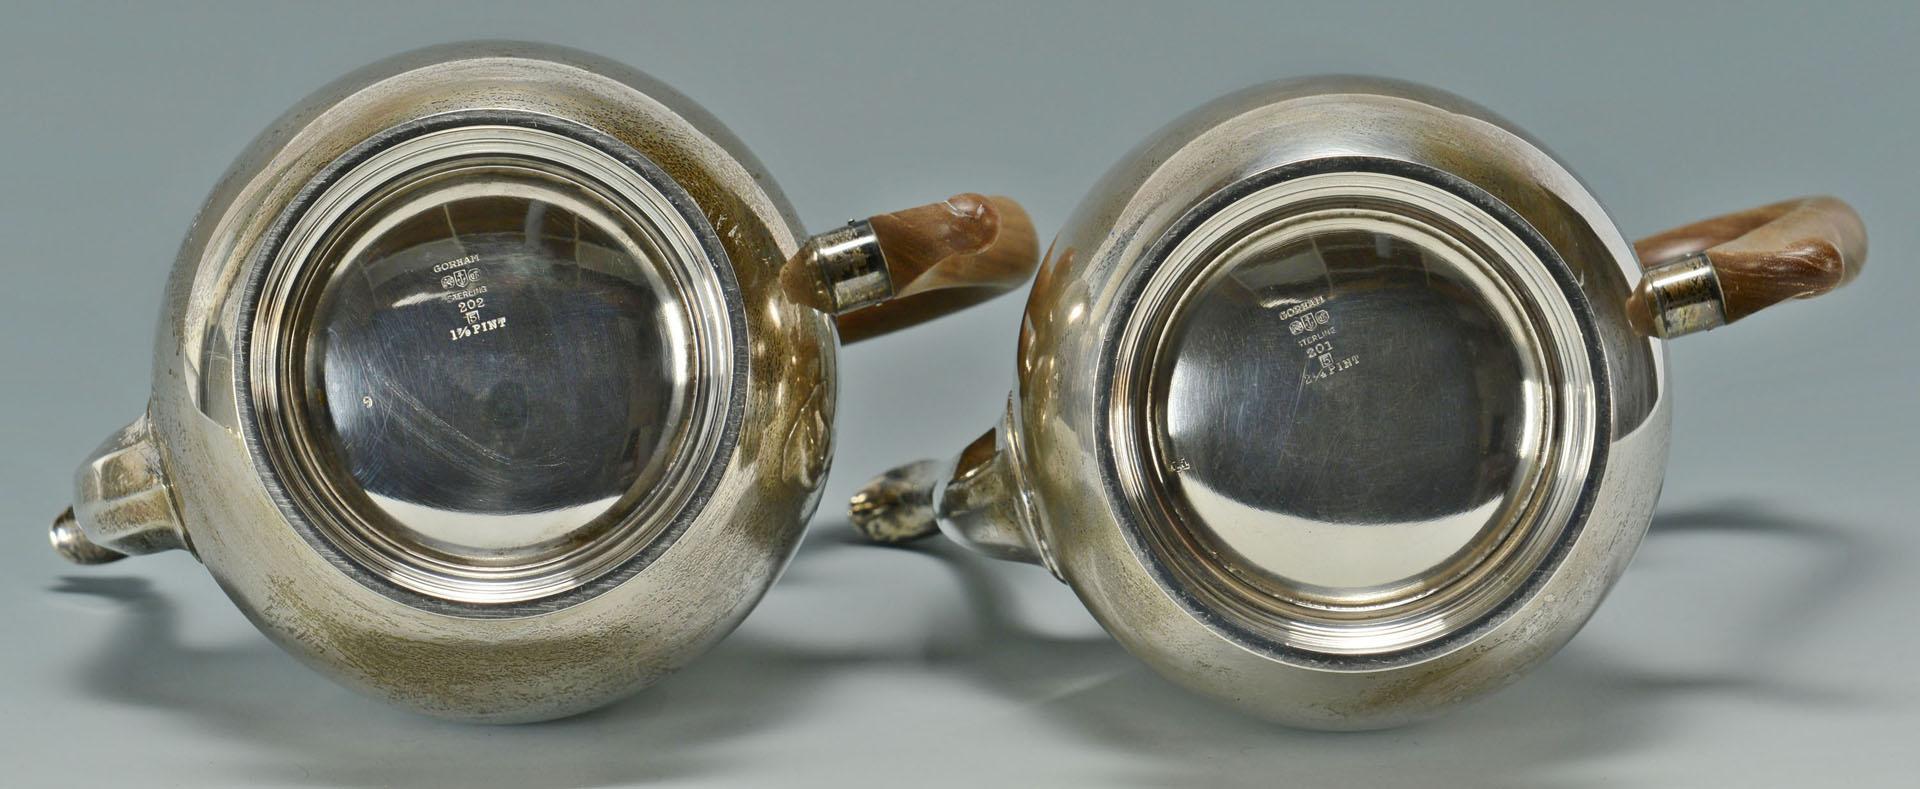 Lot 296: Gorham Sterling Silver Tea Service, 201 pattern